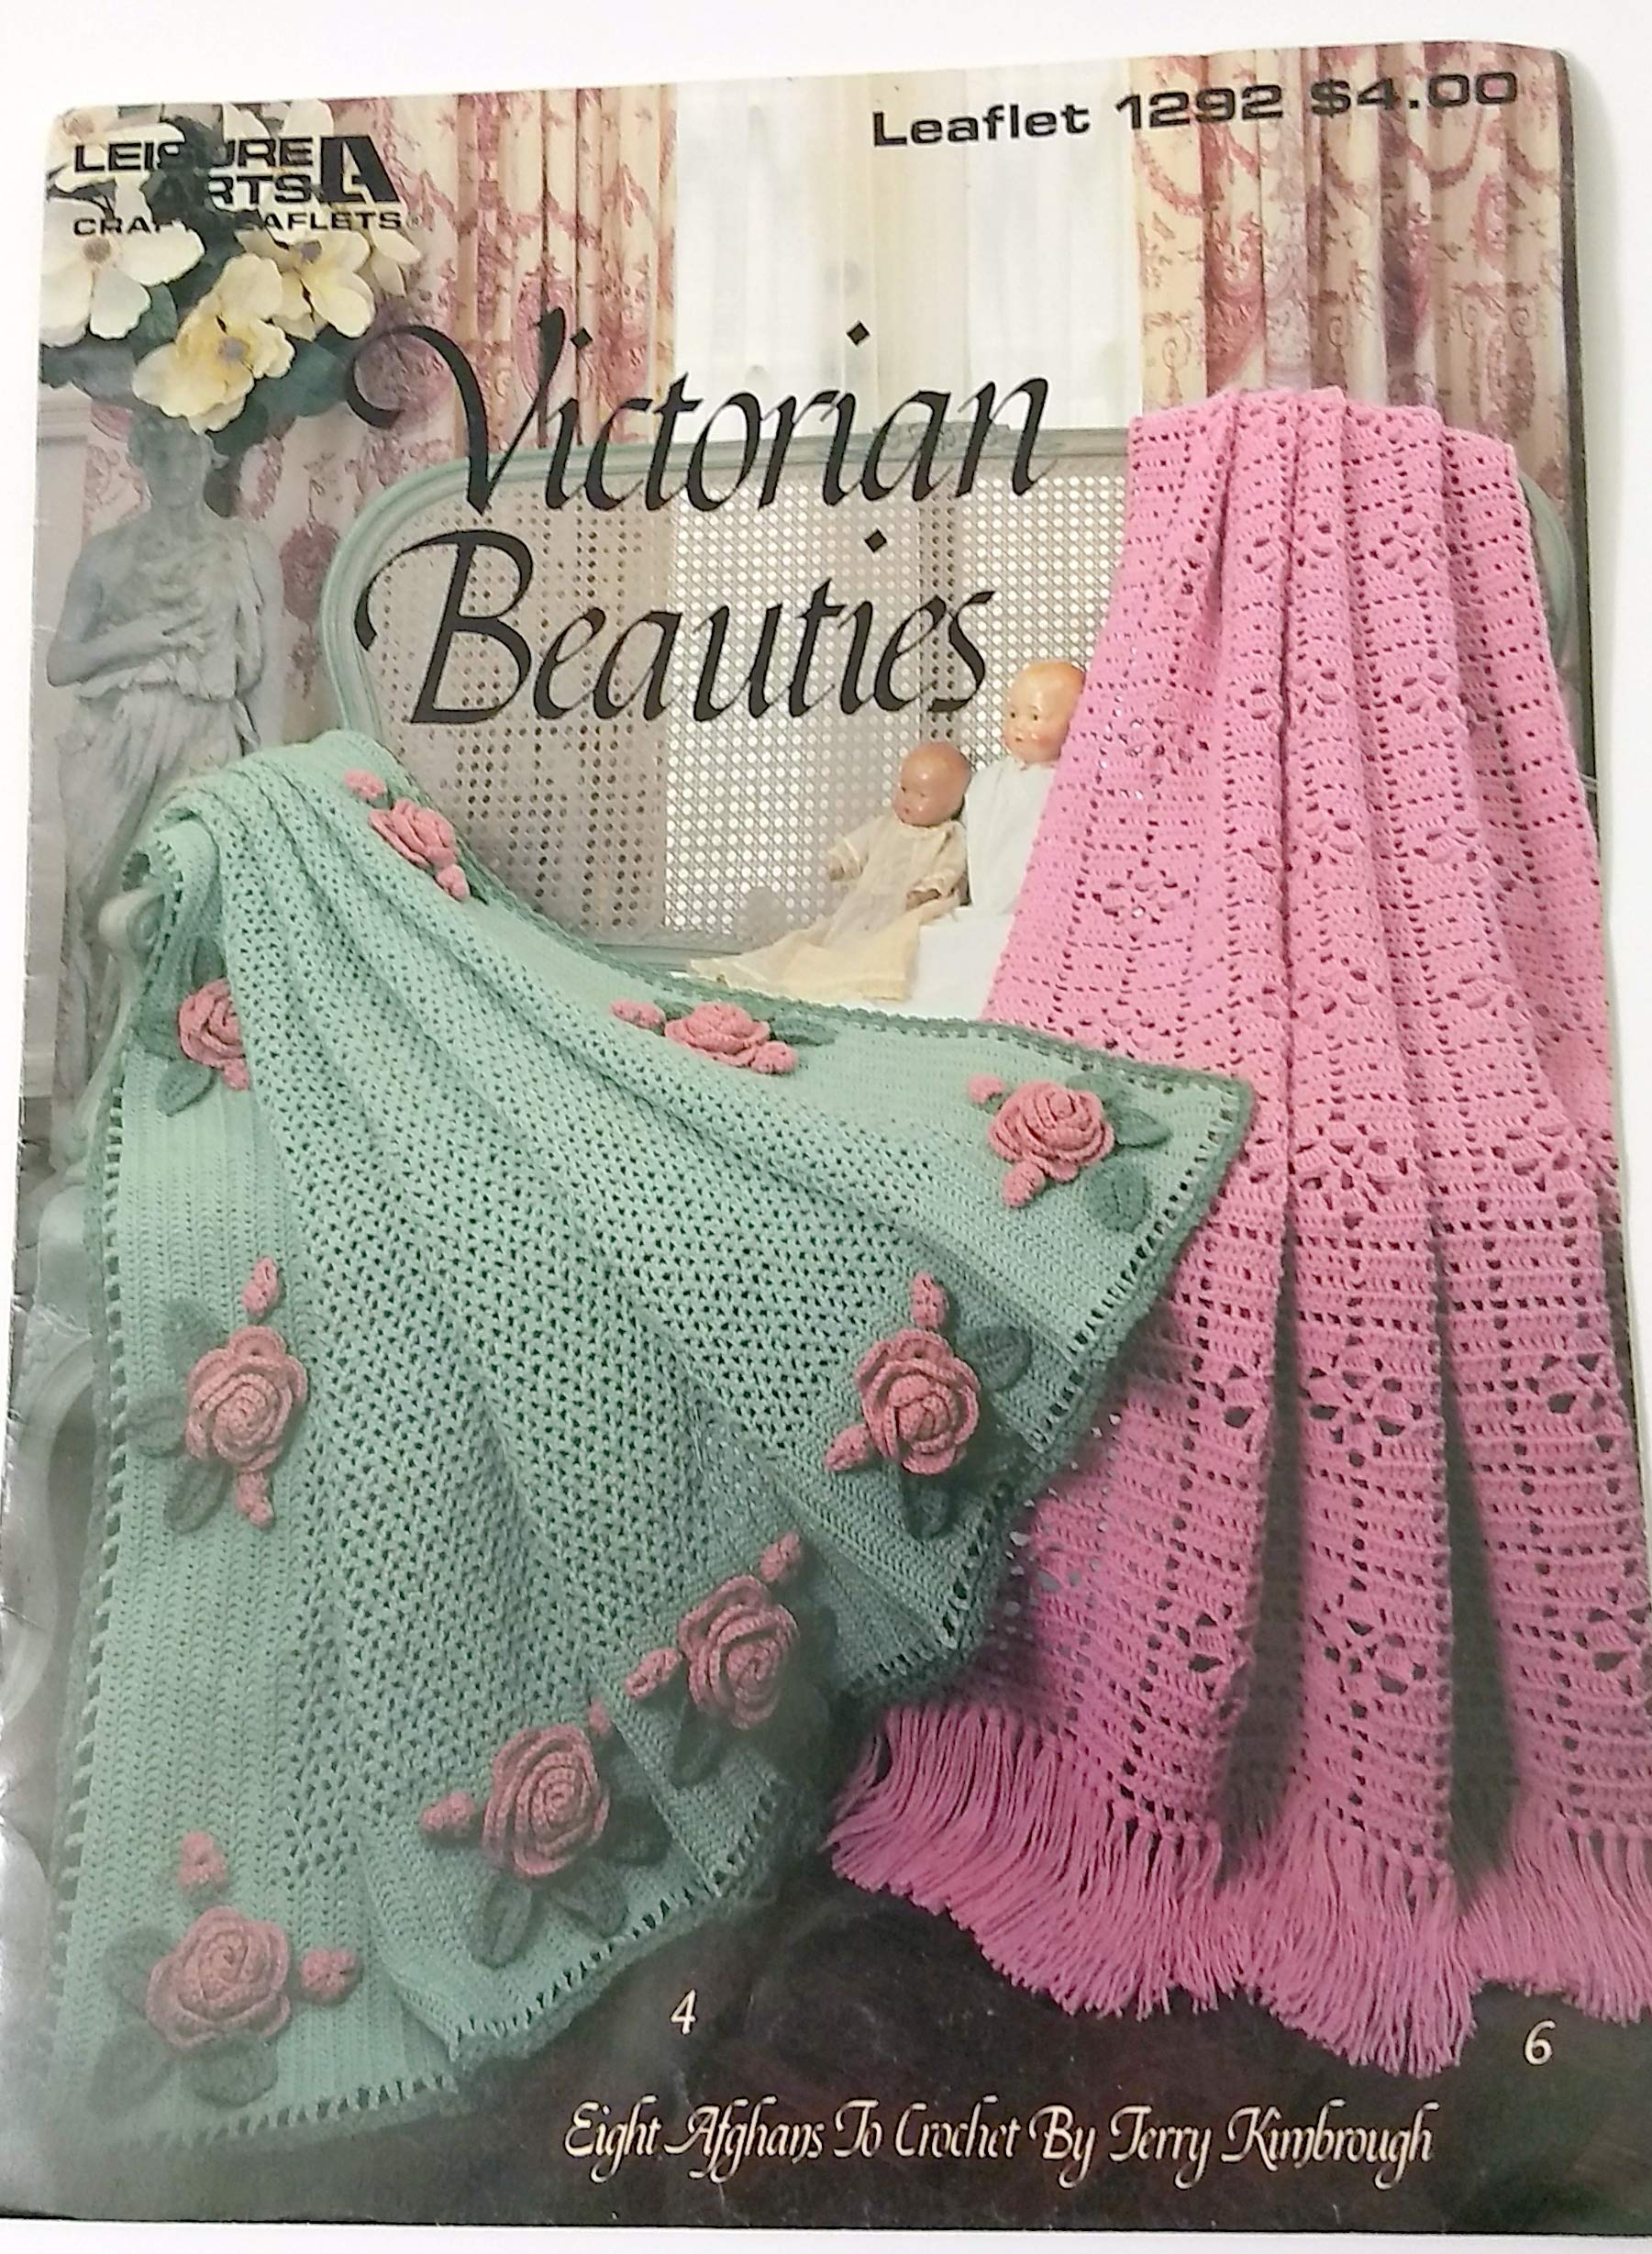 Victorian Beauties Crochet Afghans Leisure Arts Leaflet 1292